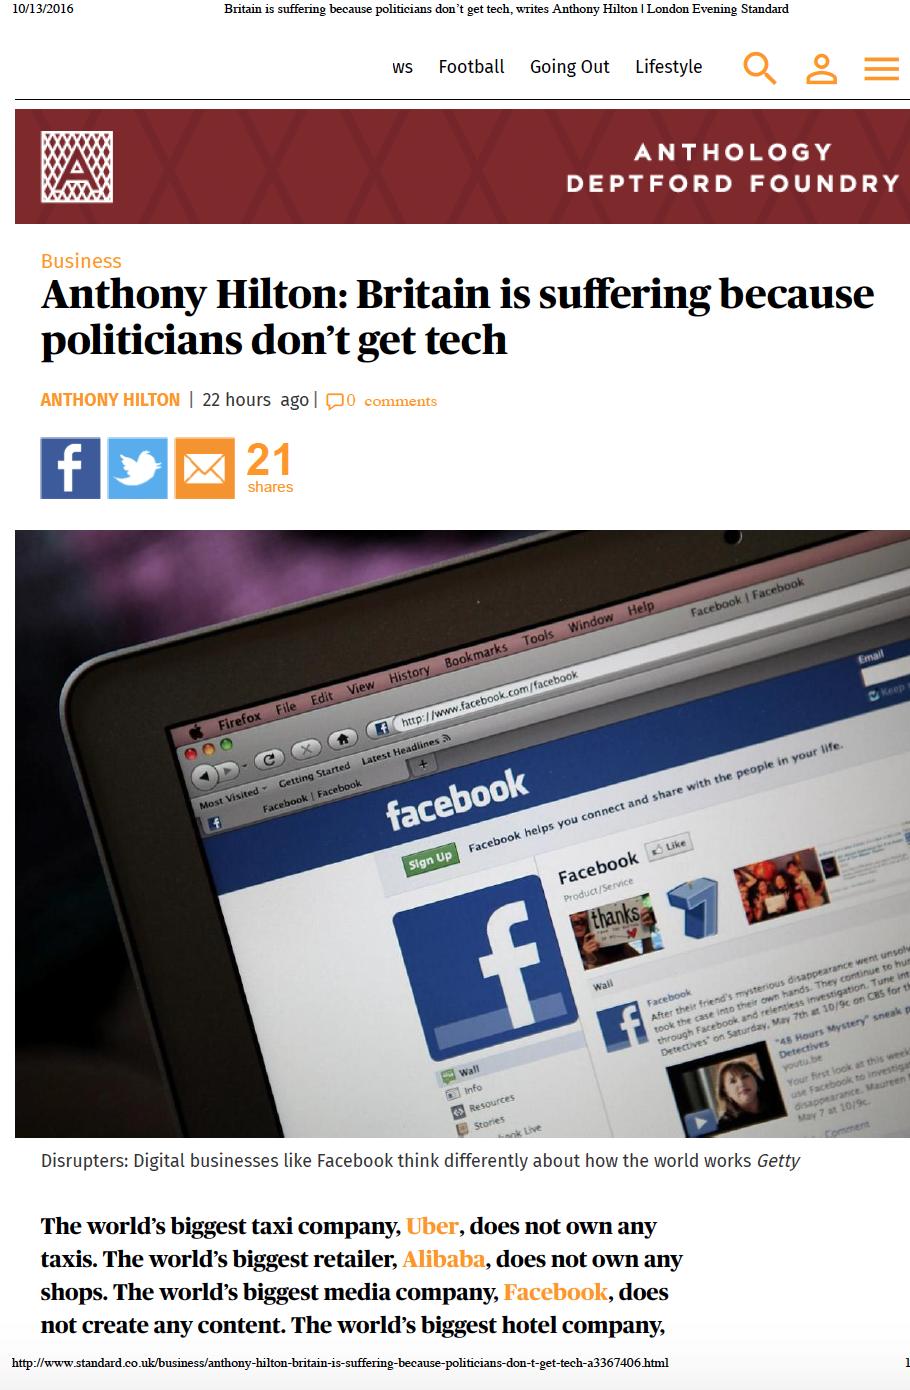 Evening Standard Column - Britain is Suffering because Politicians Don't Get Tech